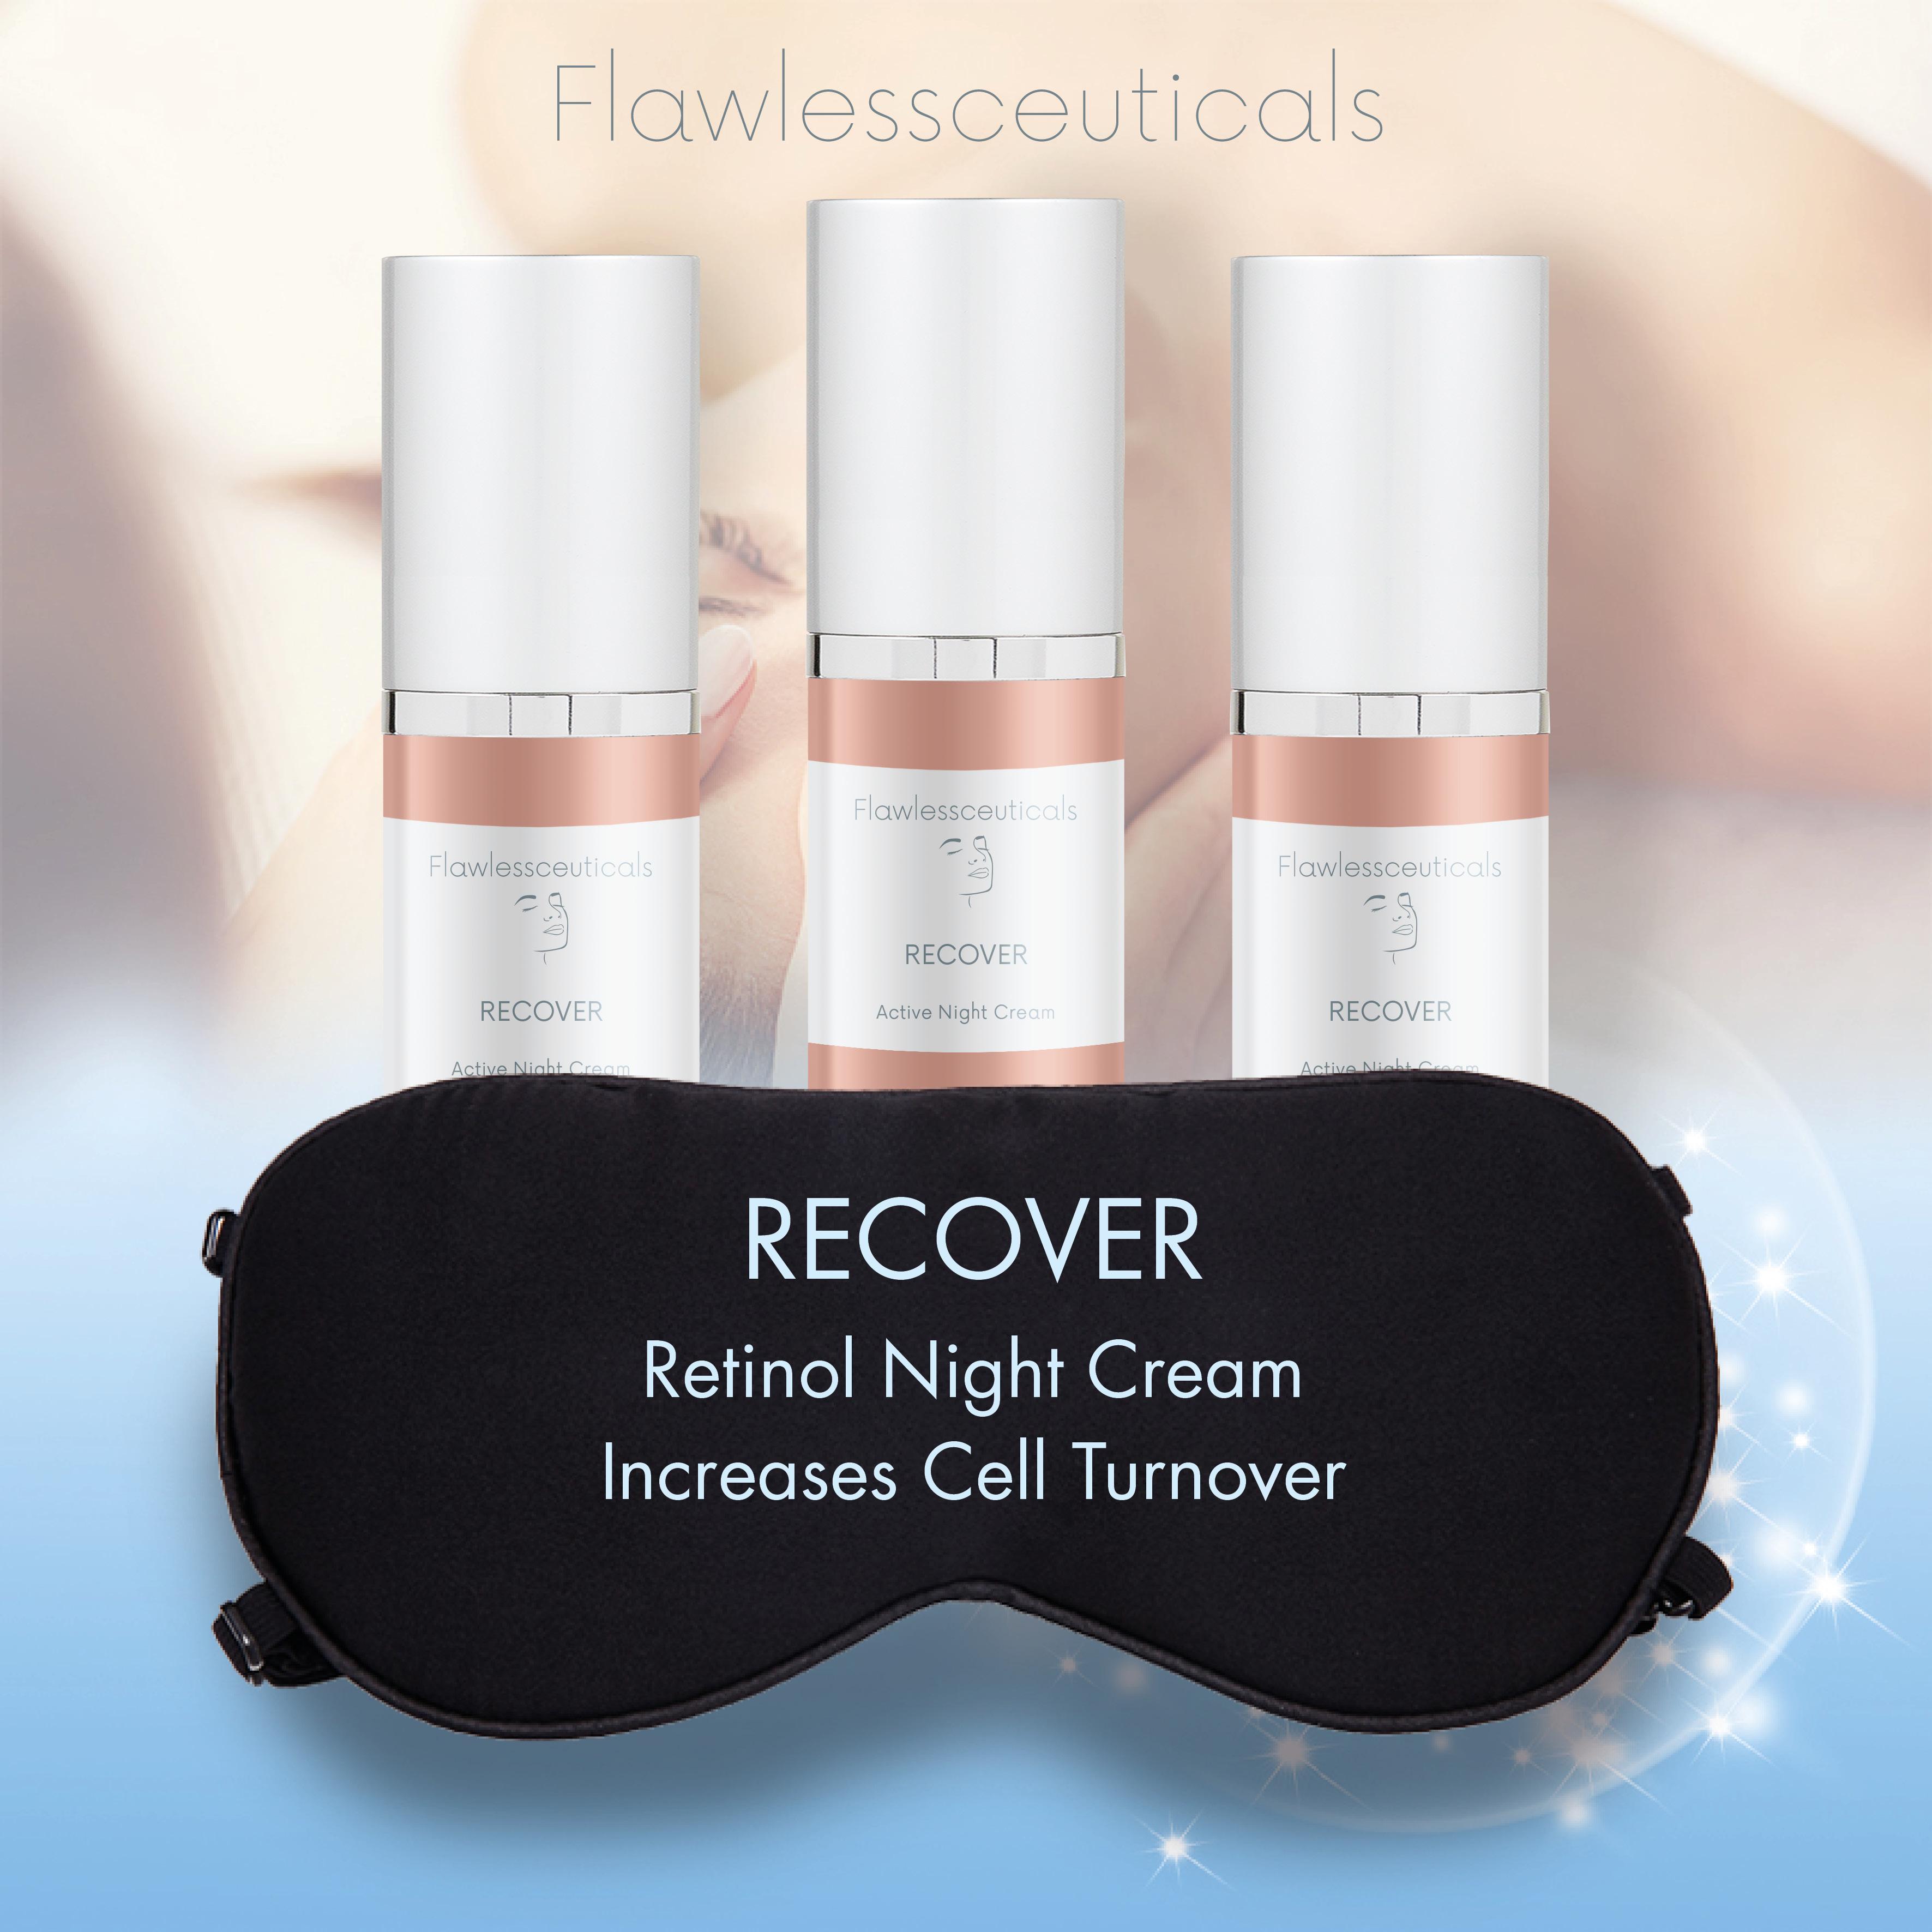 Recover retinol